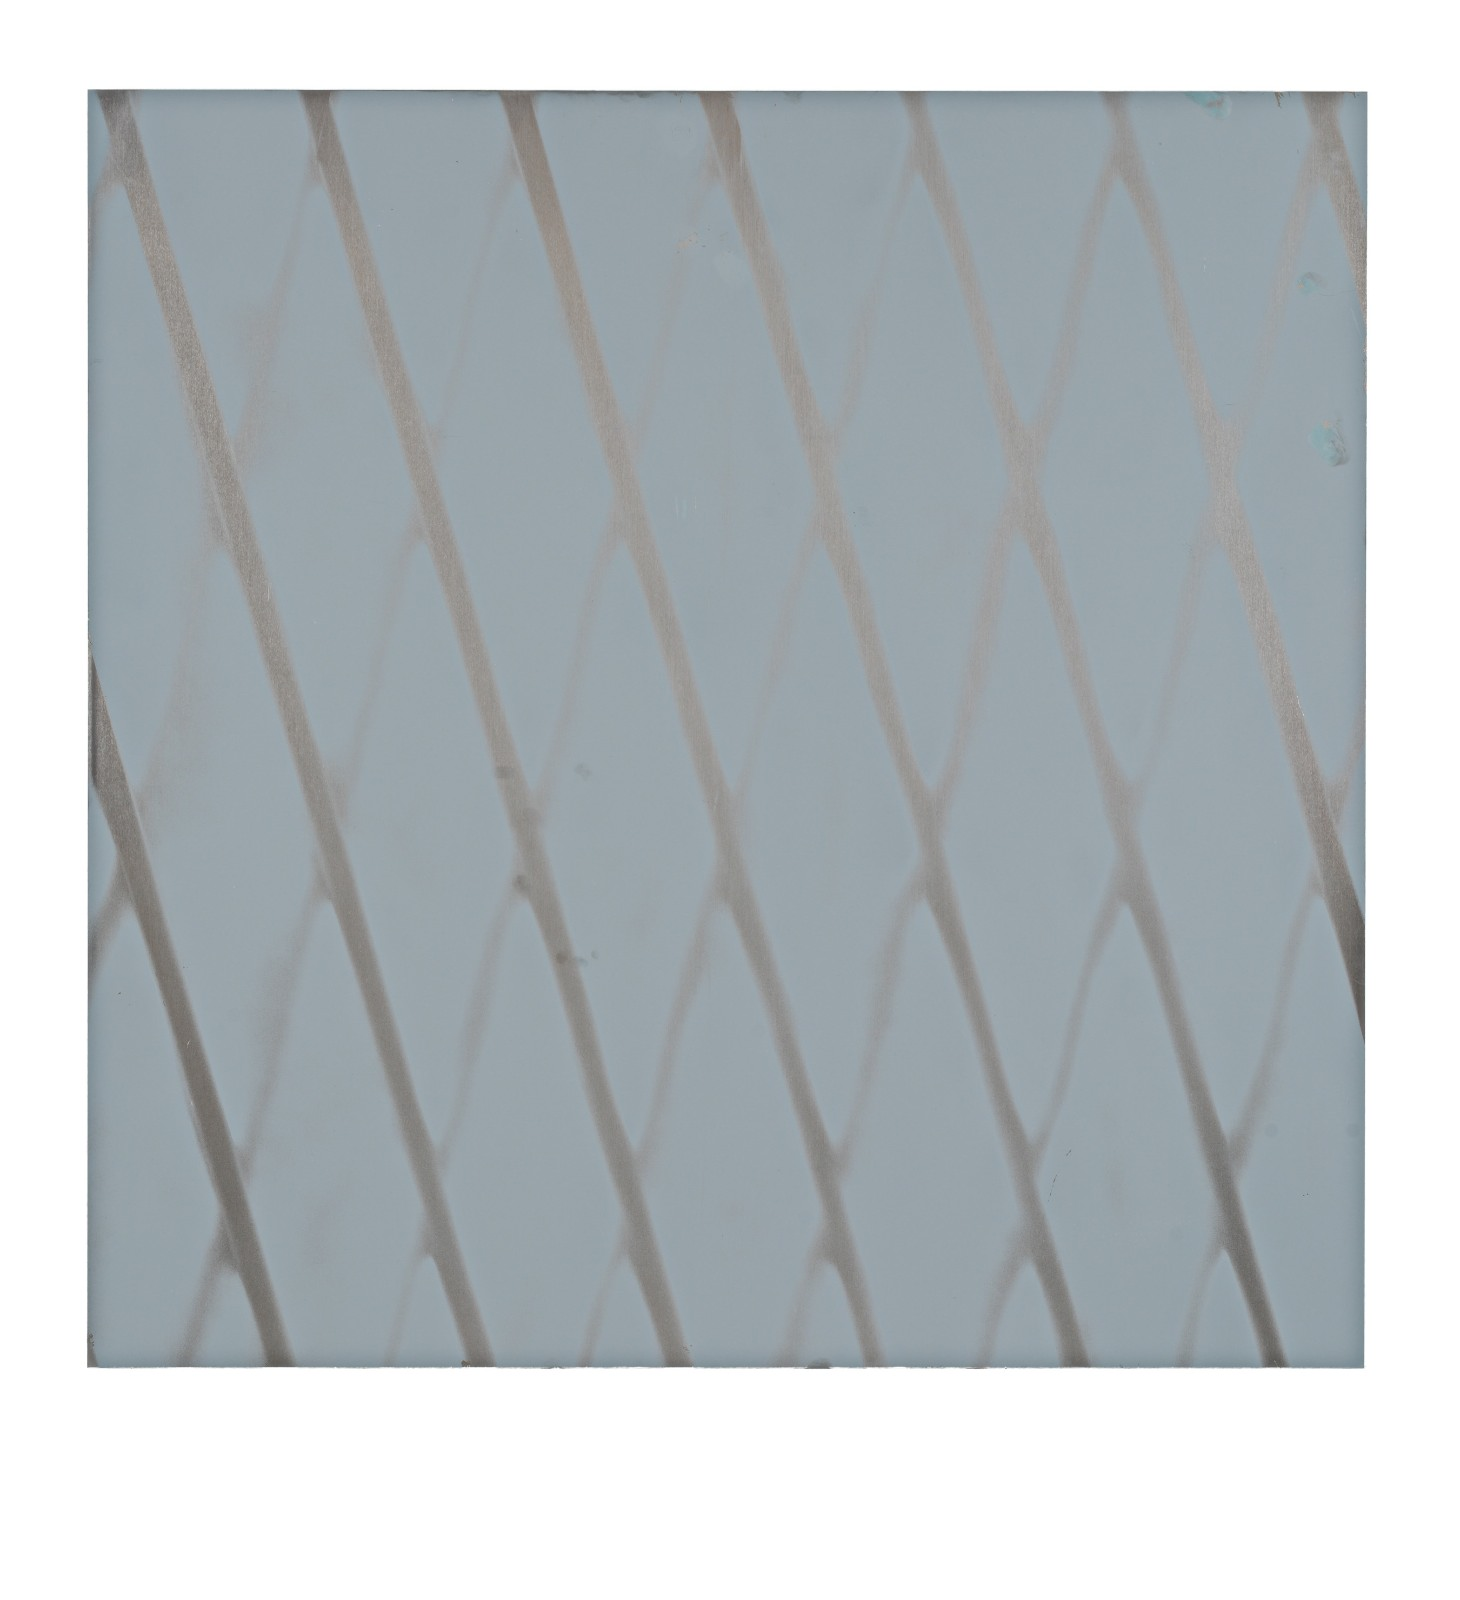 "STAIN : 40°43'11.2""N 73°56'08.9""W, 2015, spraypaint on aluminium, 81,3 x 81,3 cm"